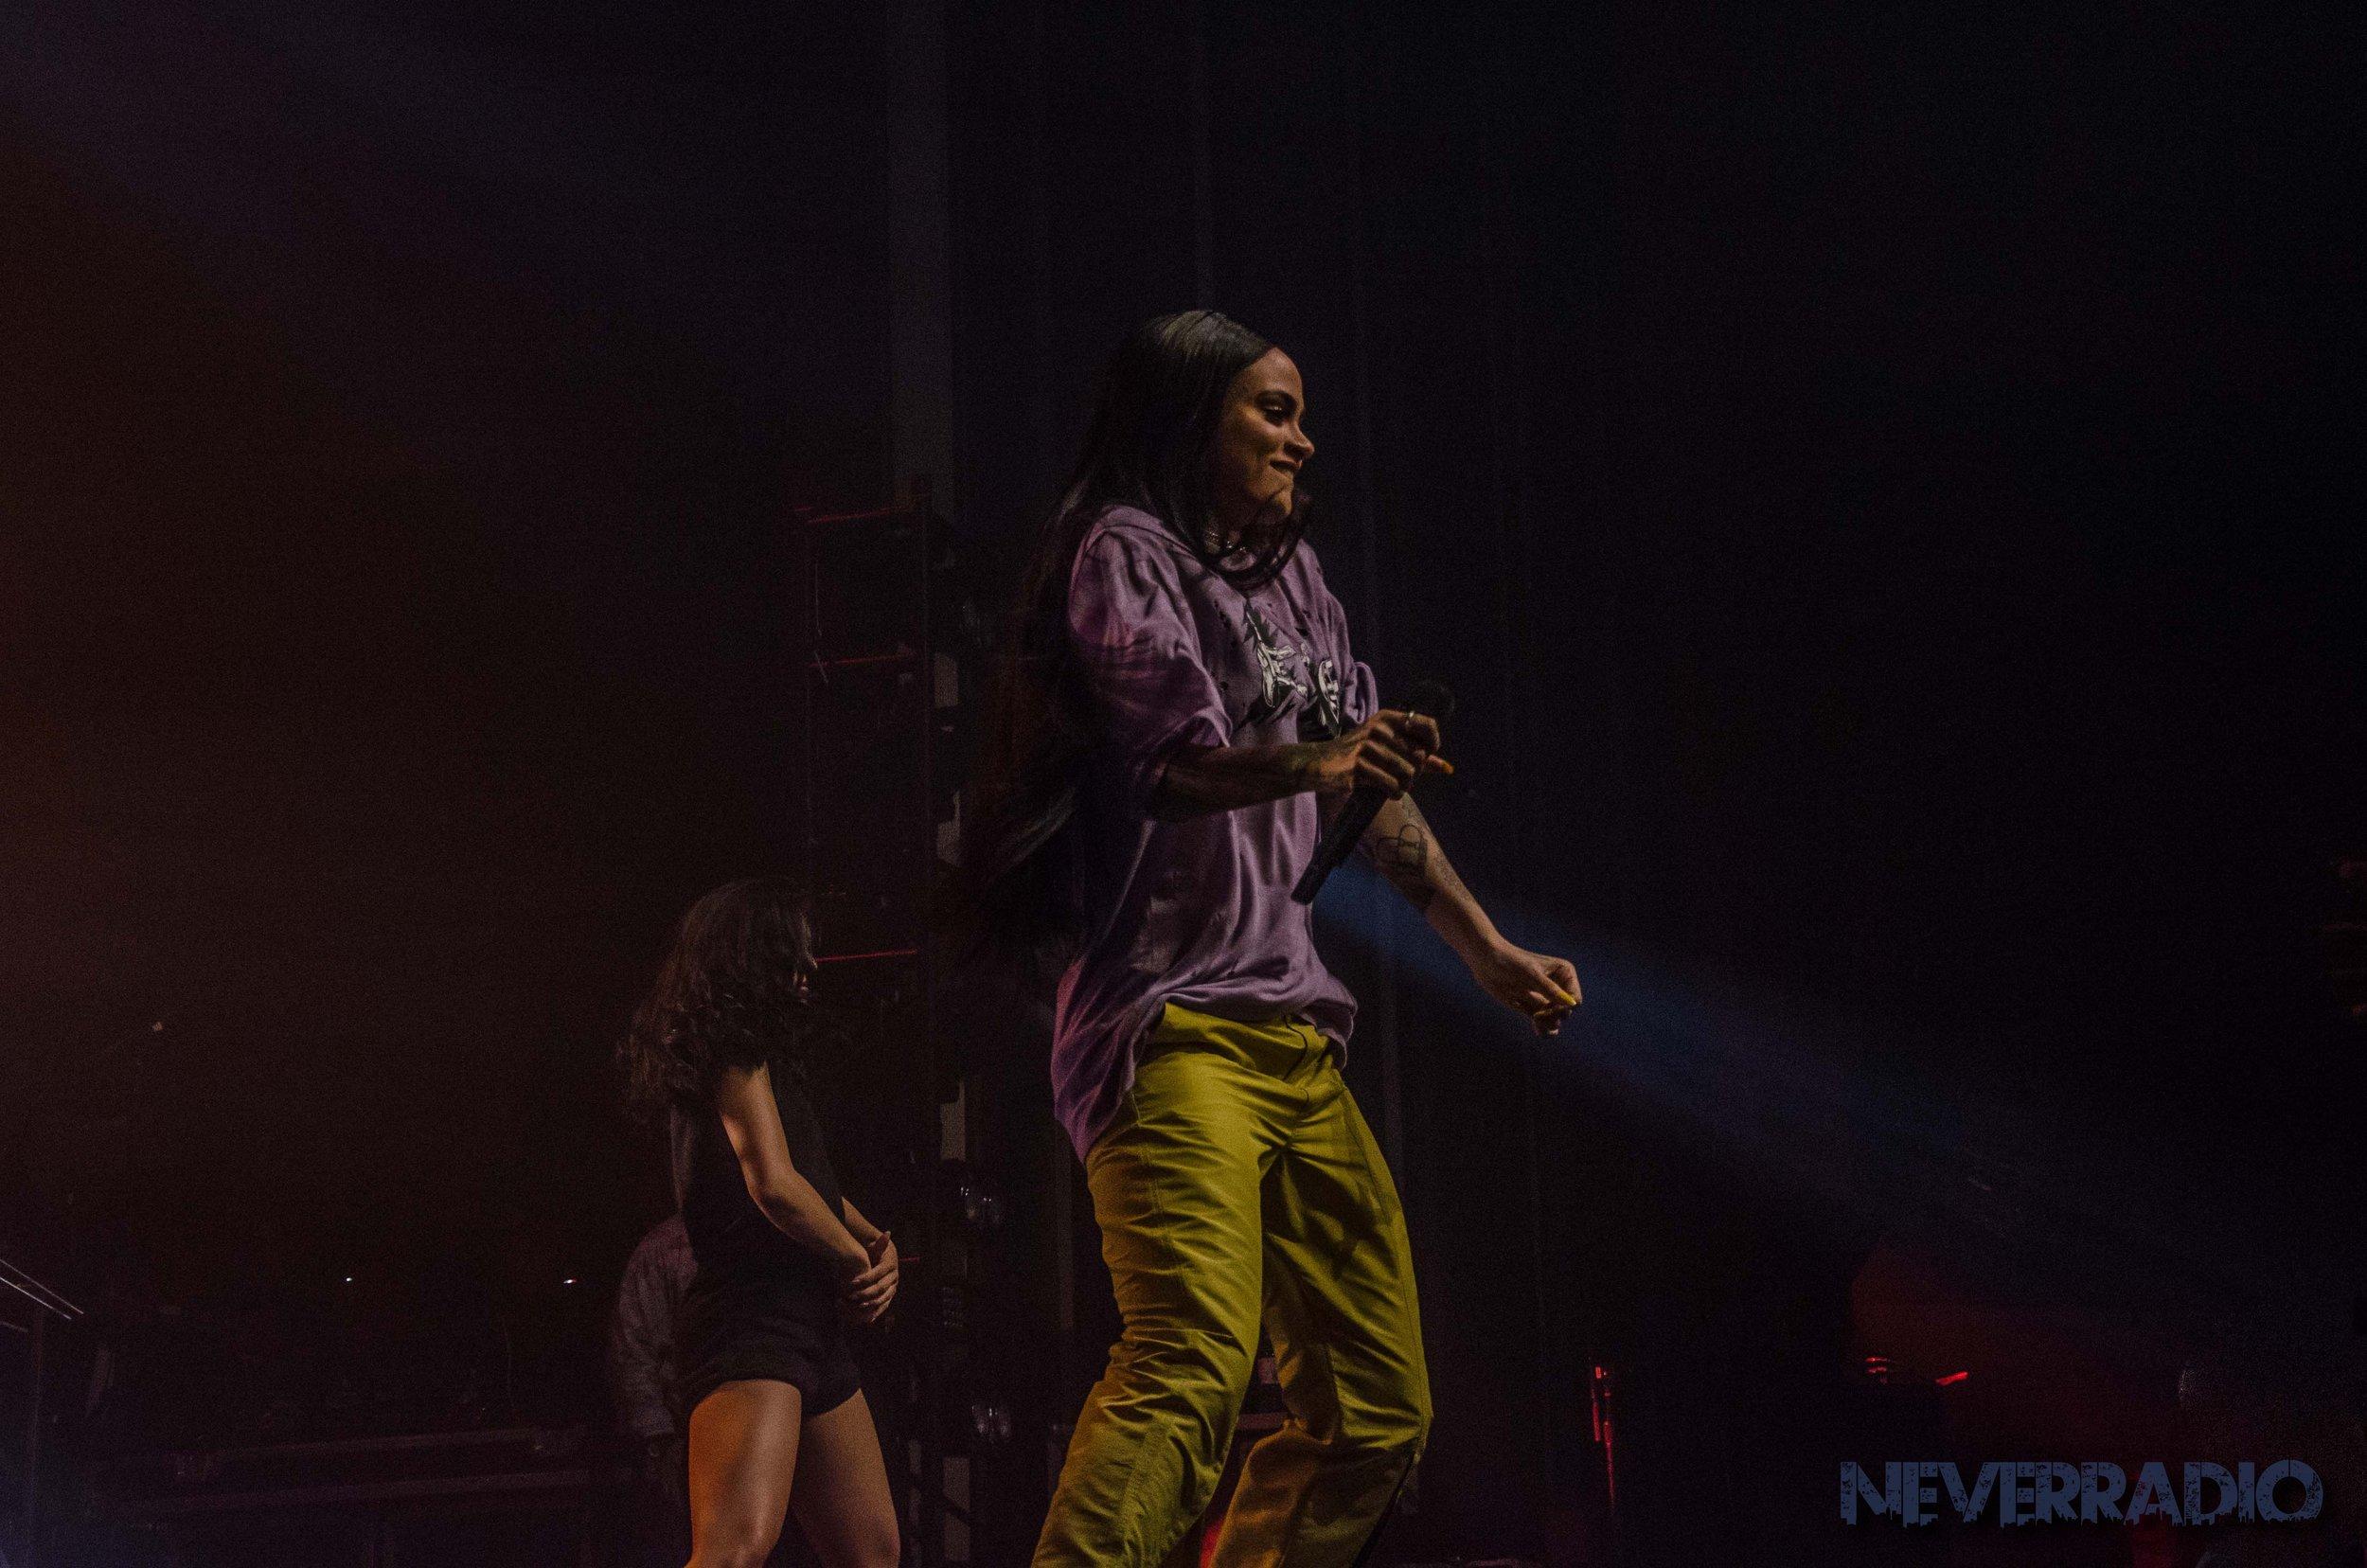 Kehlani Live Concert Show SweetSexySavage